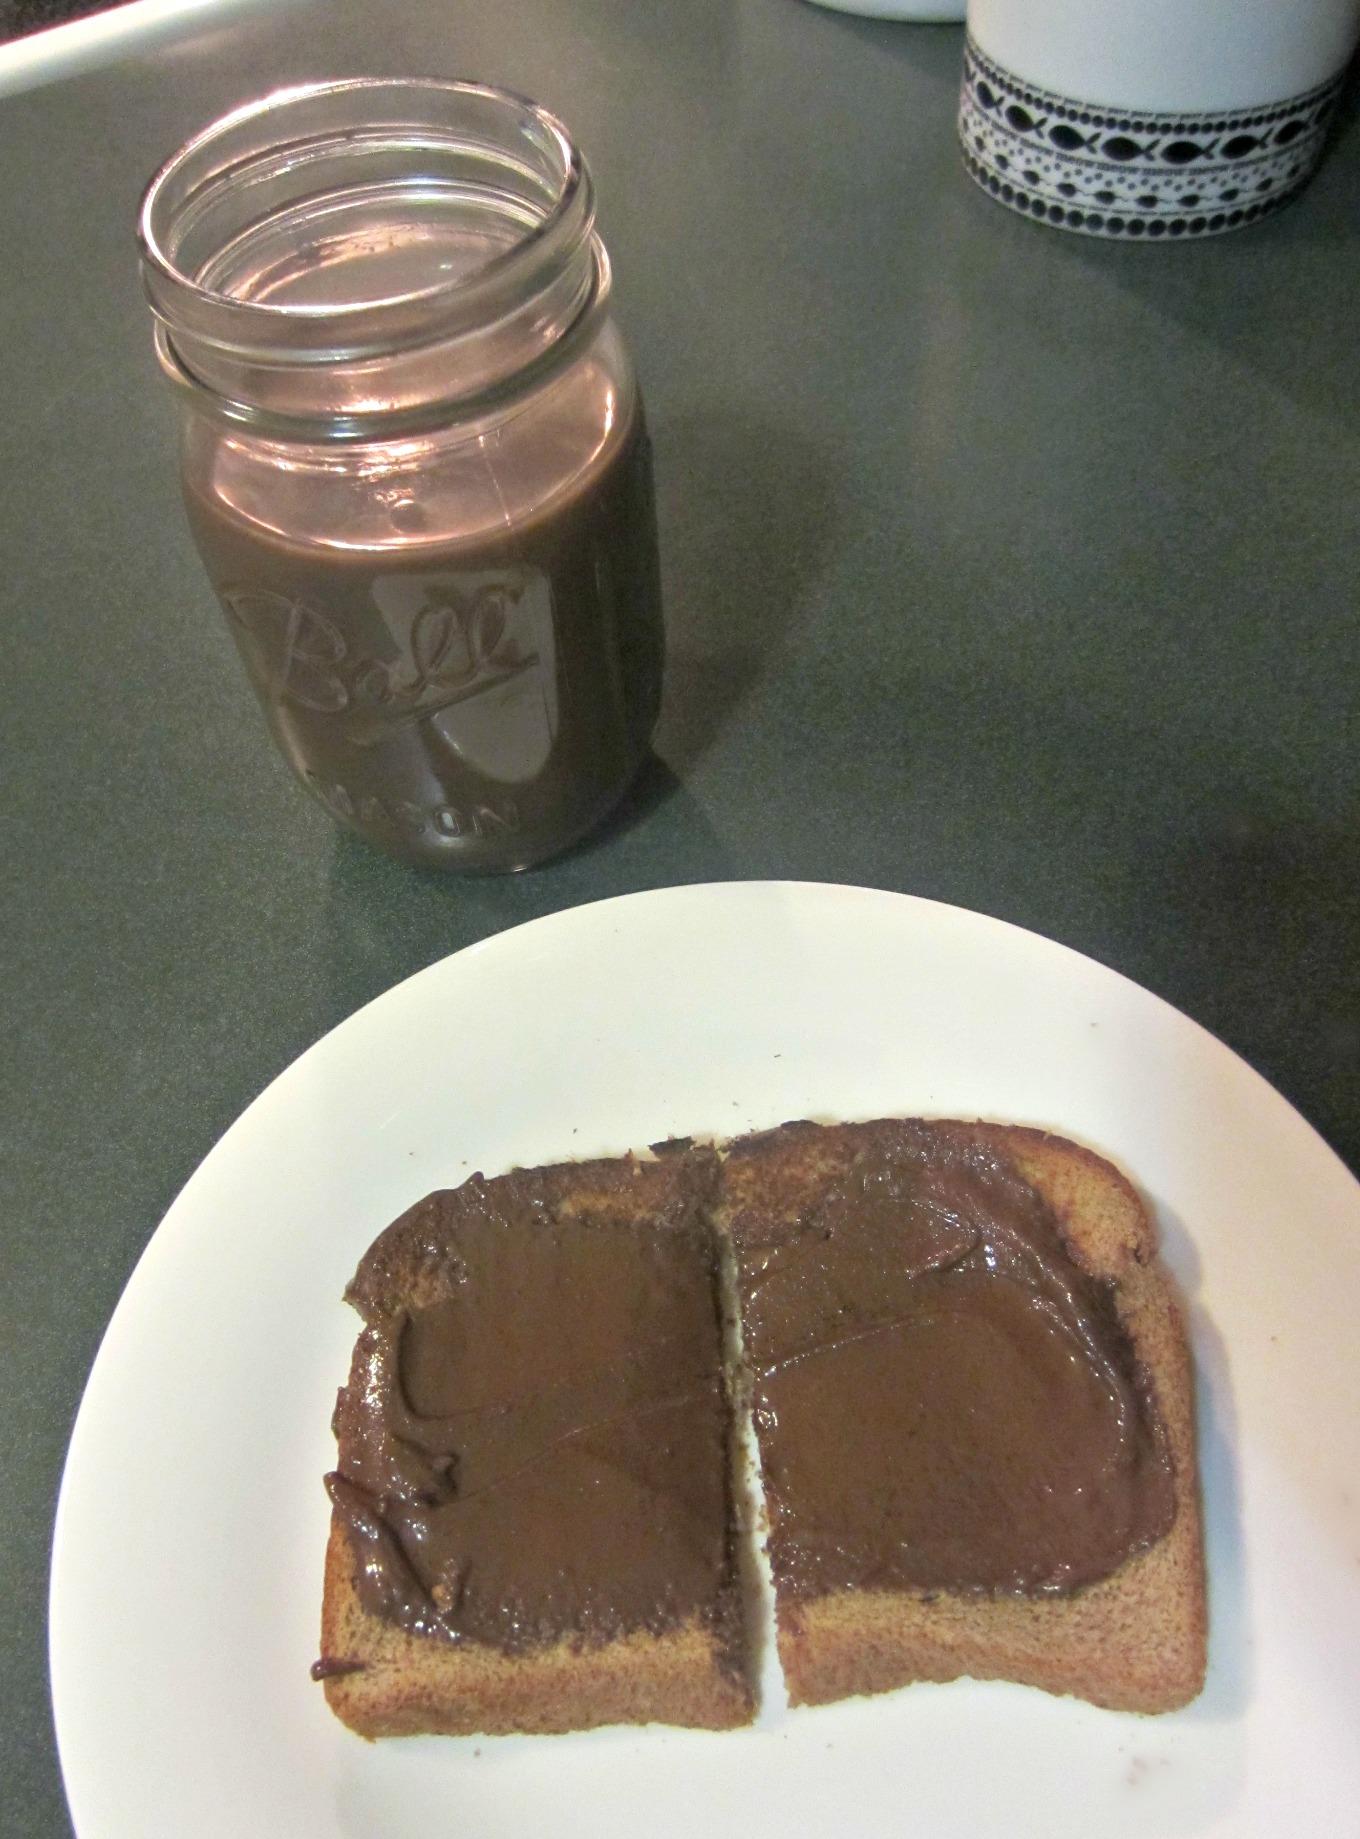 dark chocolate almond milk and toast